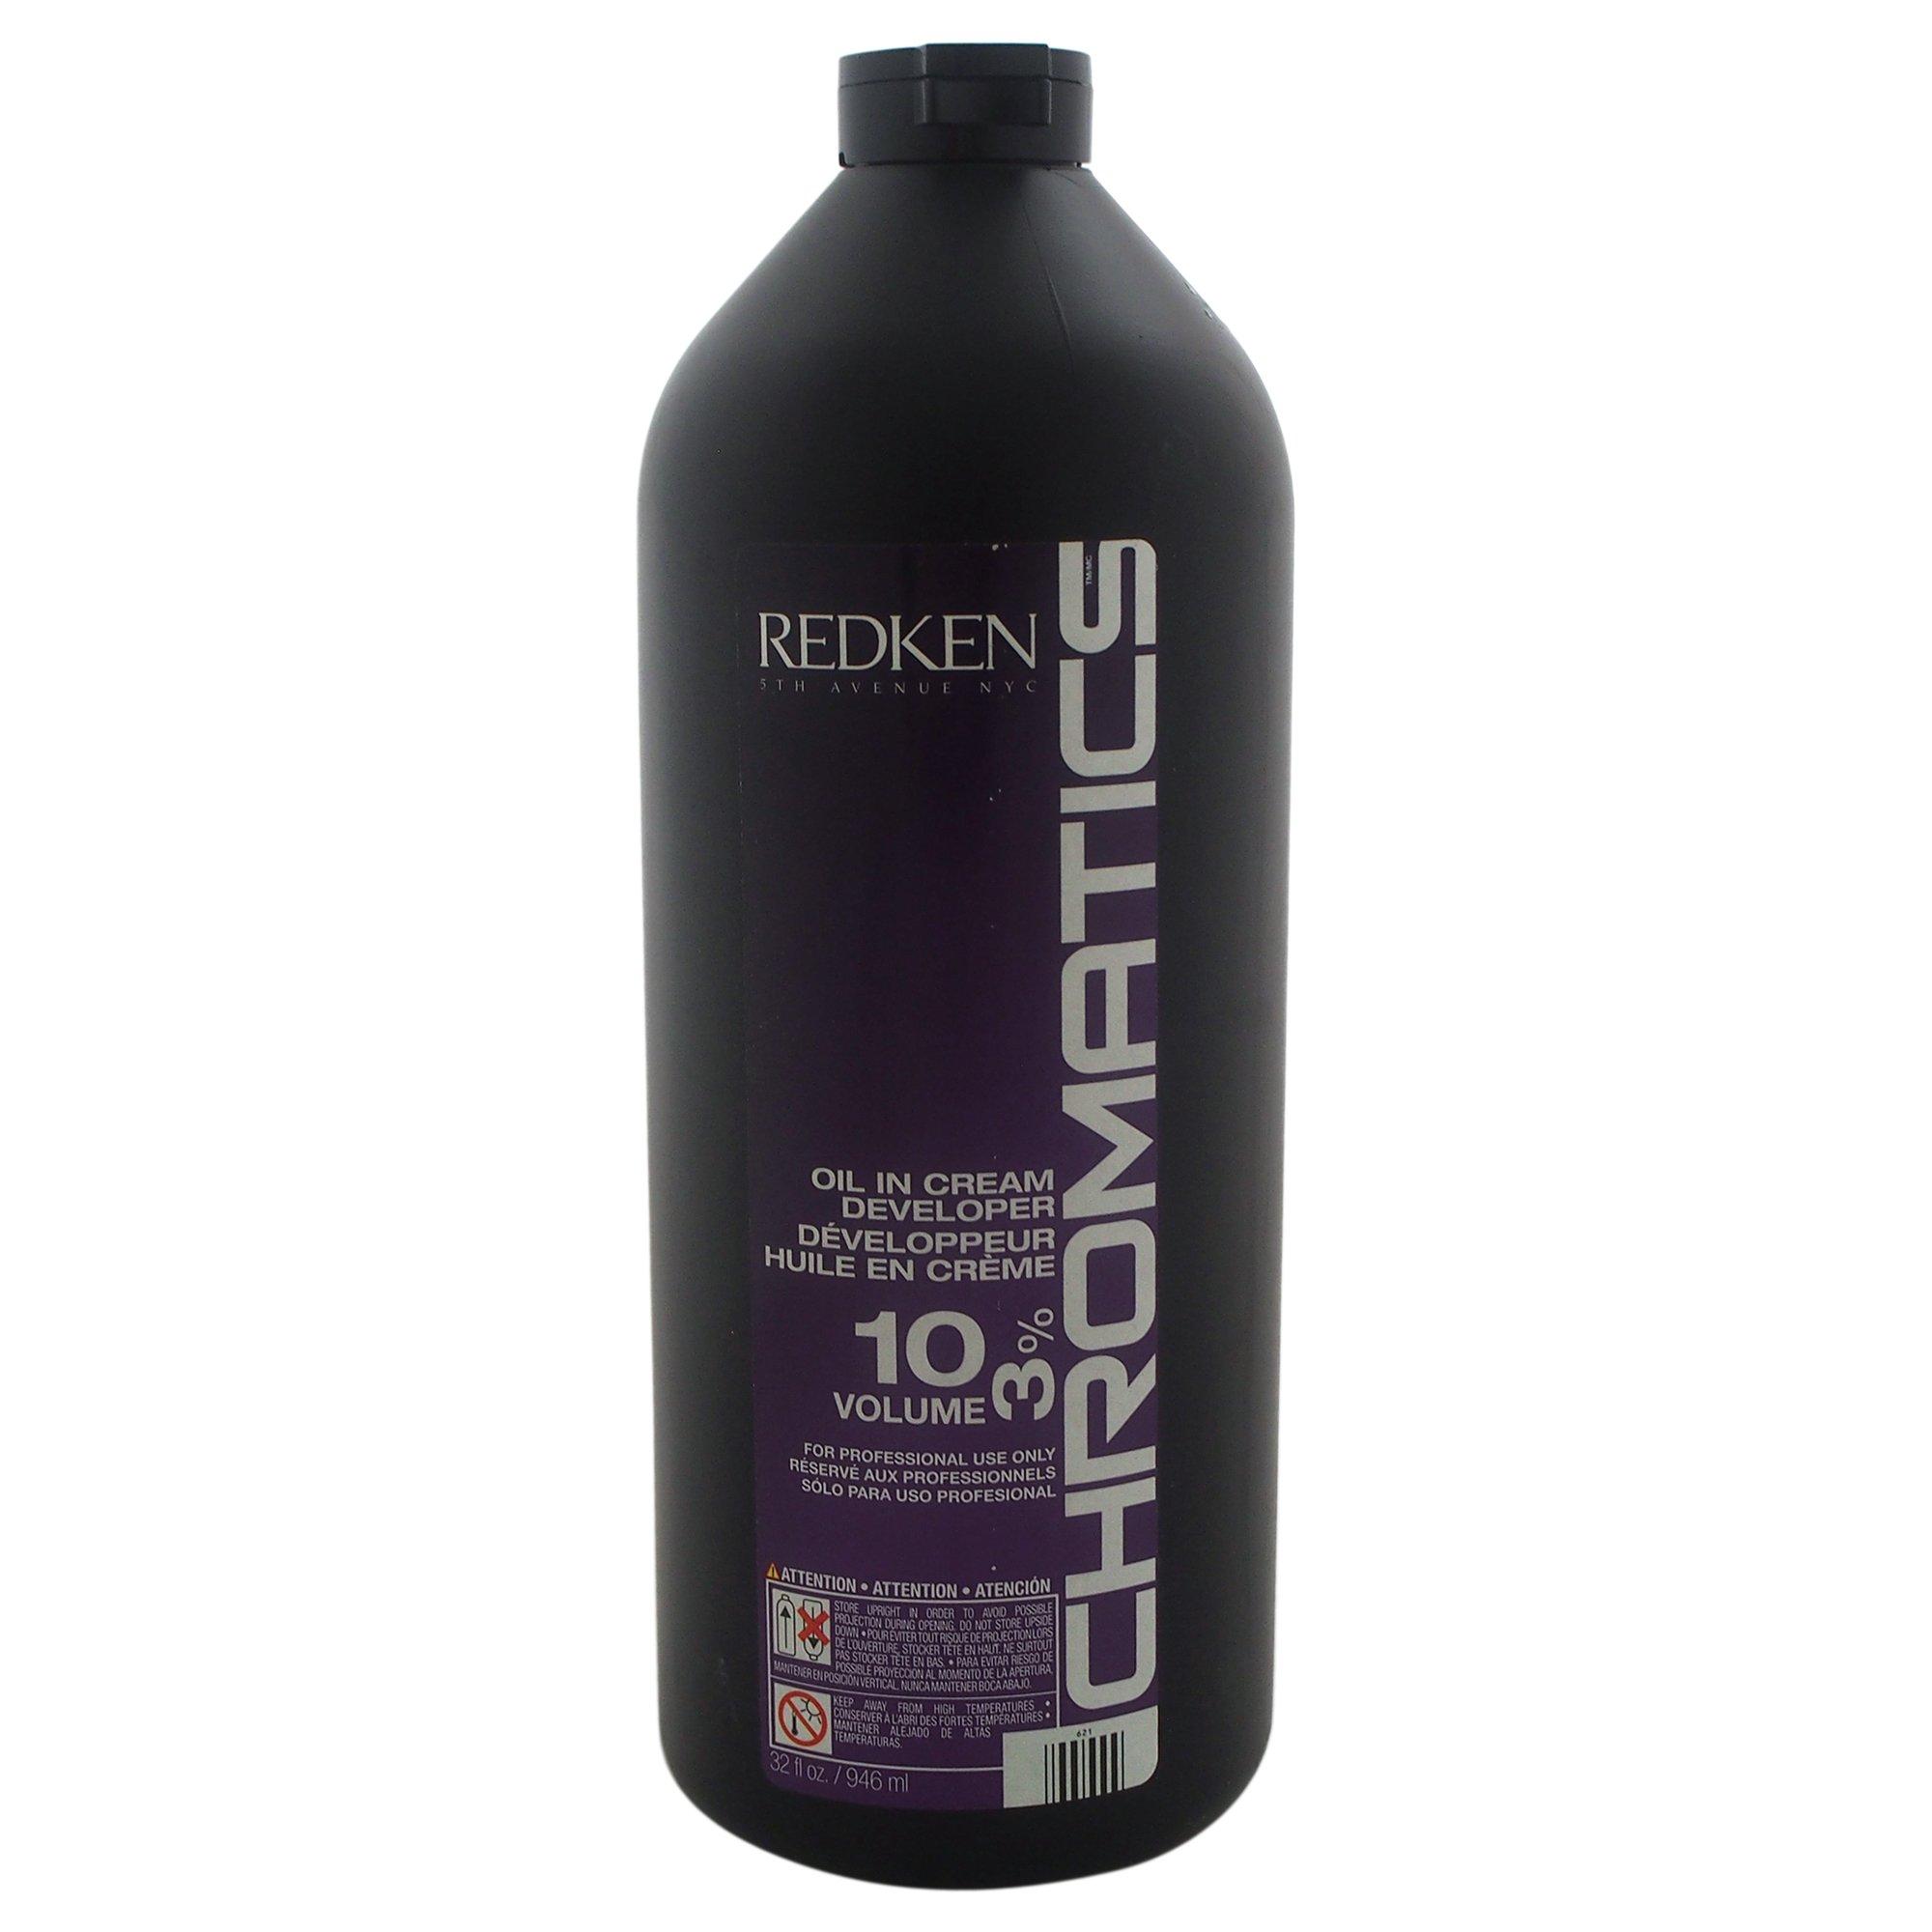 Redken Chromatics Oil In Cream Developer 10 Volume 3 Percent Cream, 32 Ounce